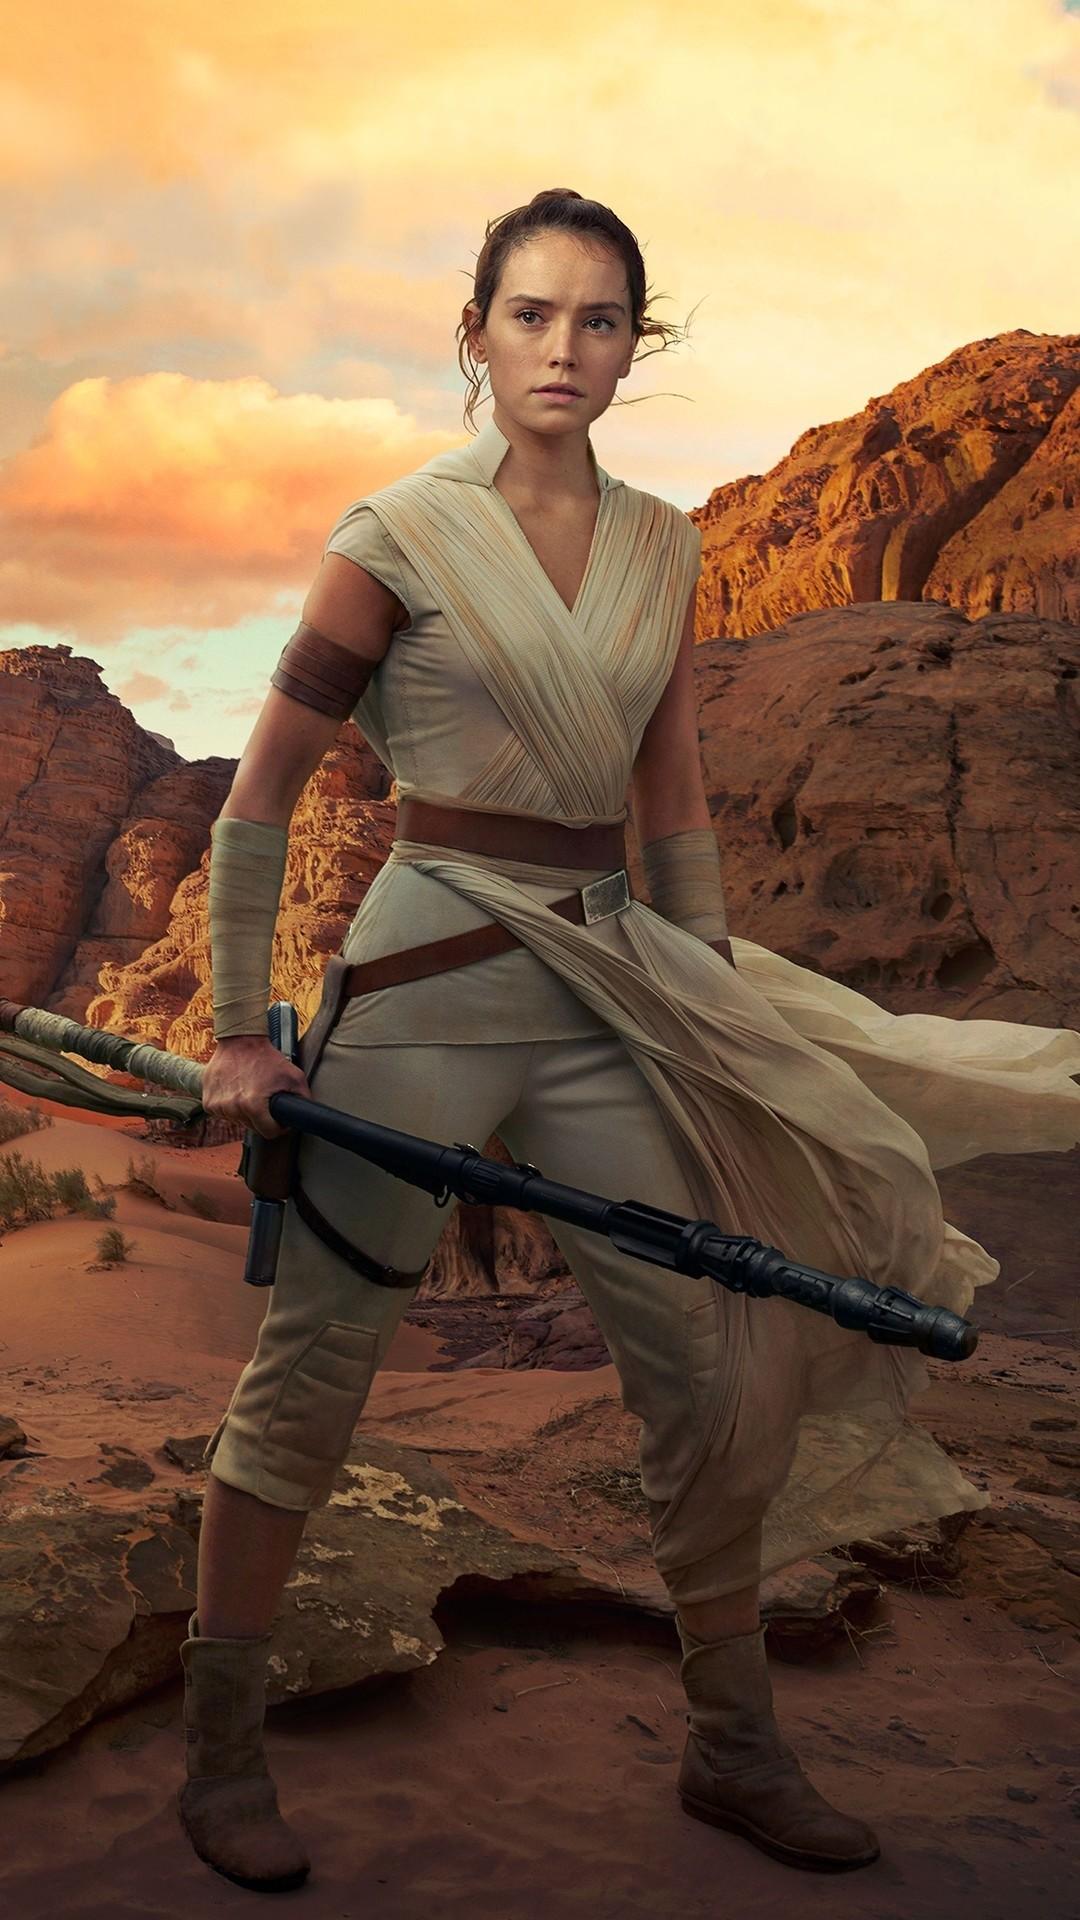 Star Wars The Rise Of Skywalker iphone home screen wallpaper